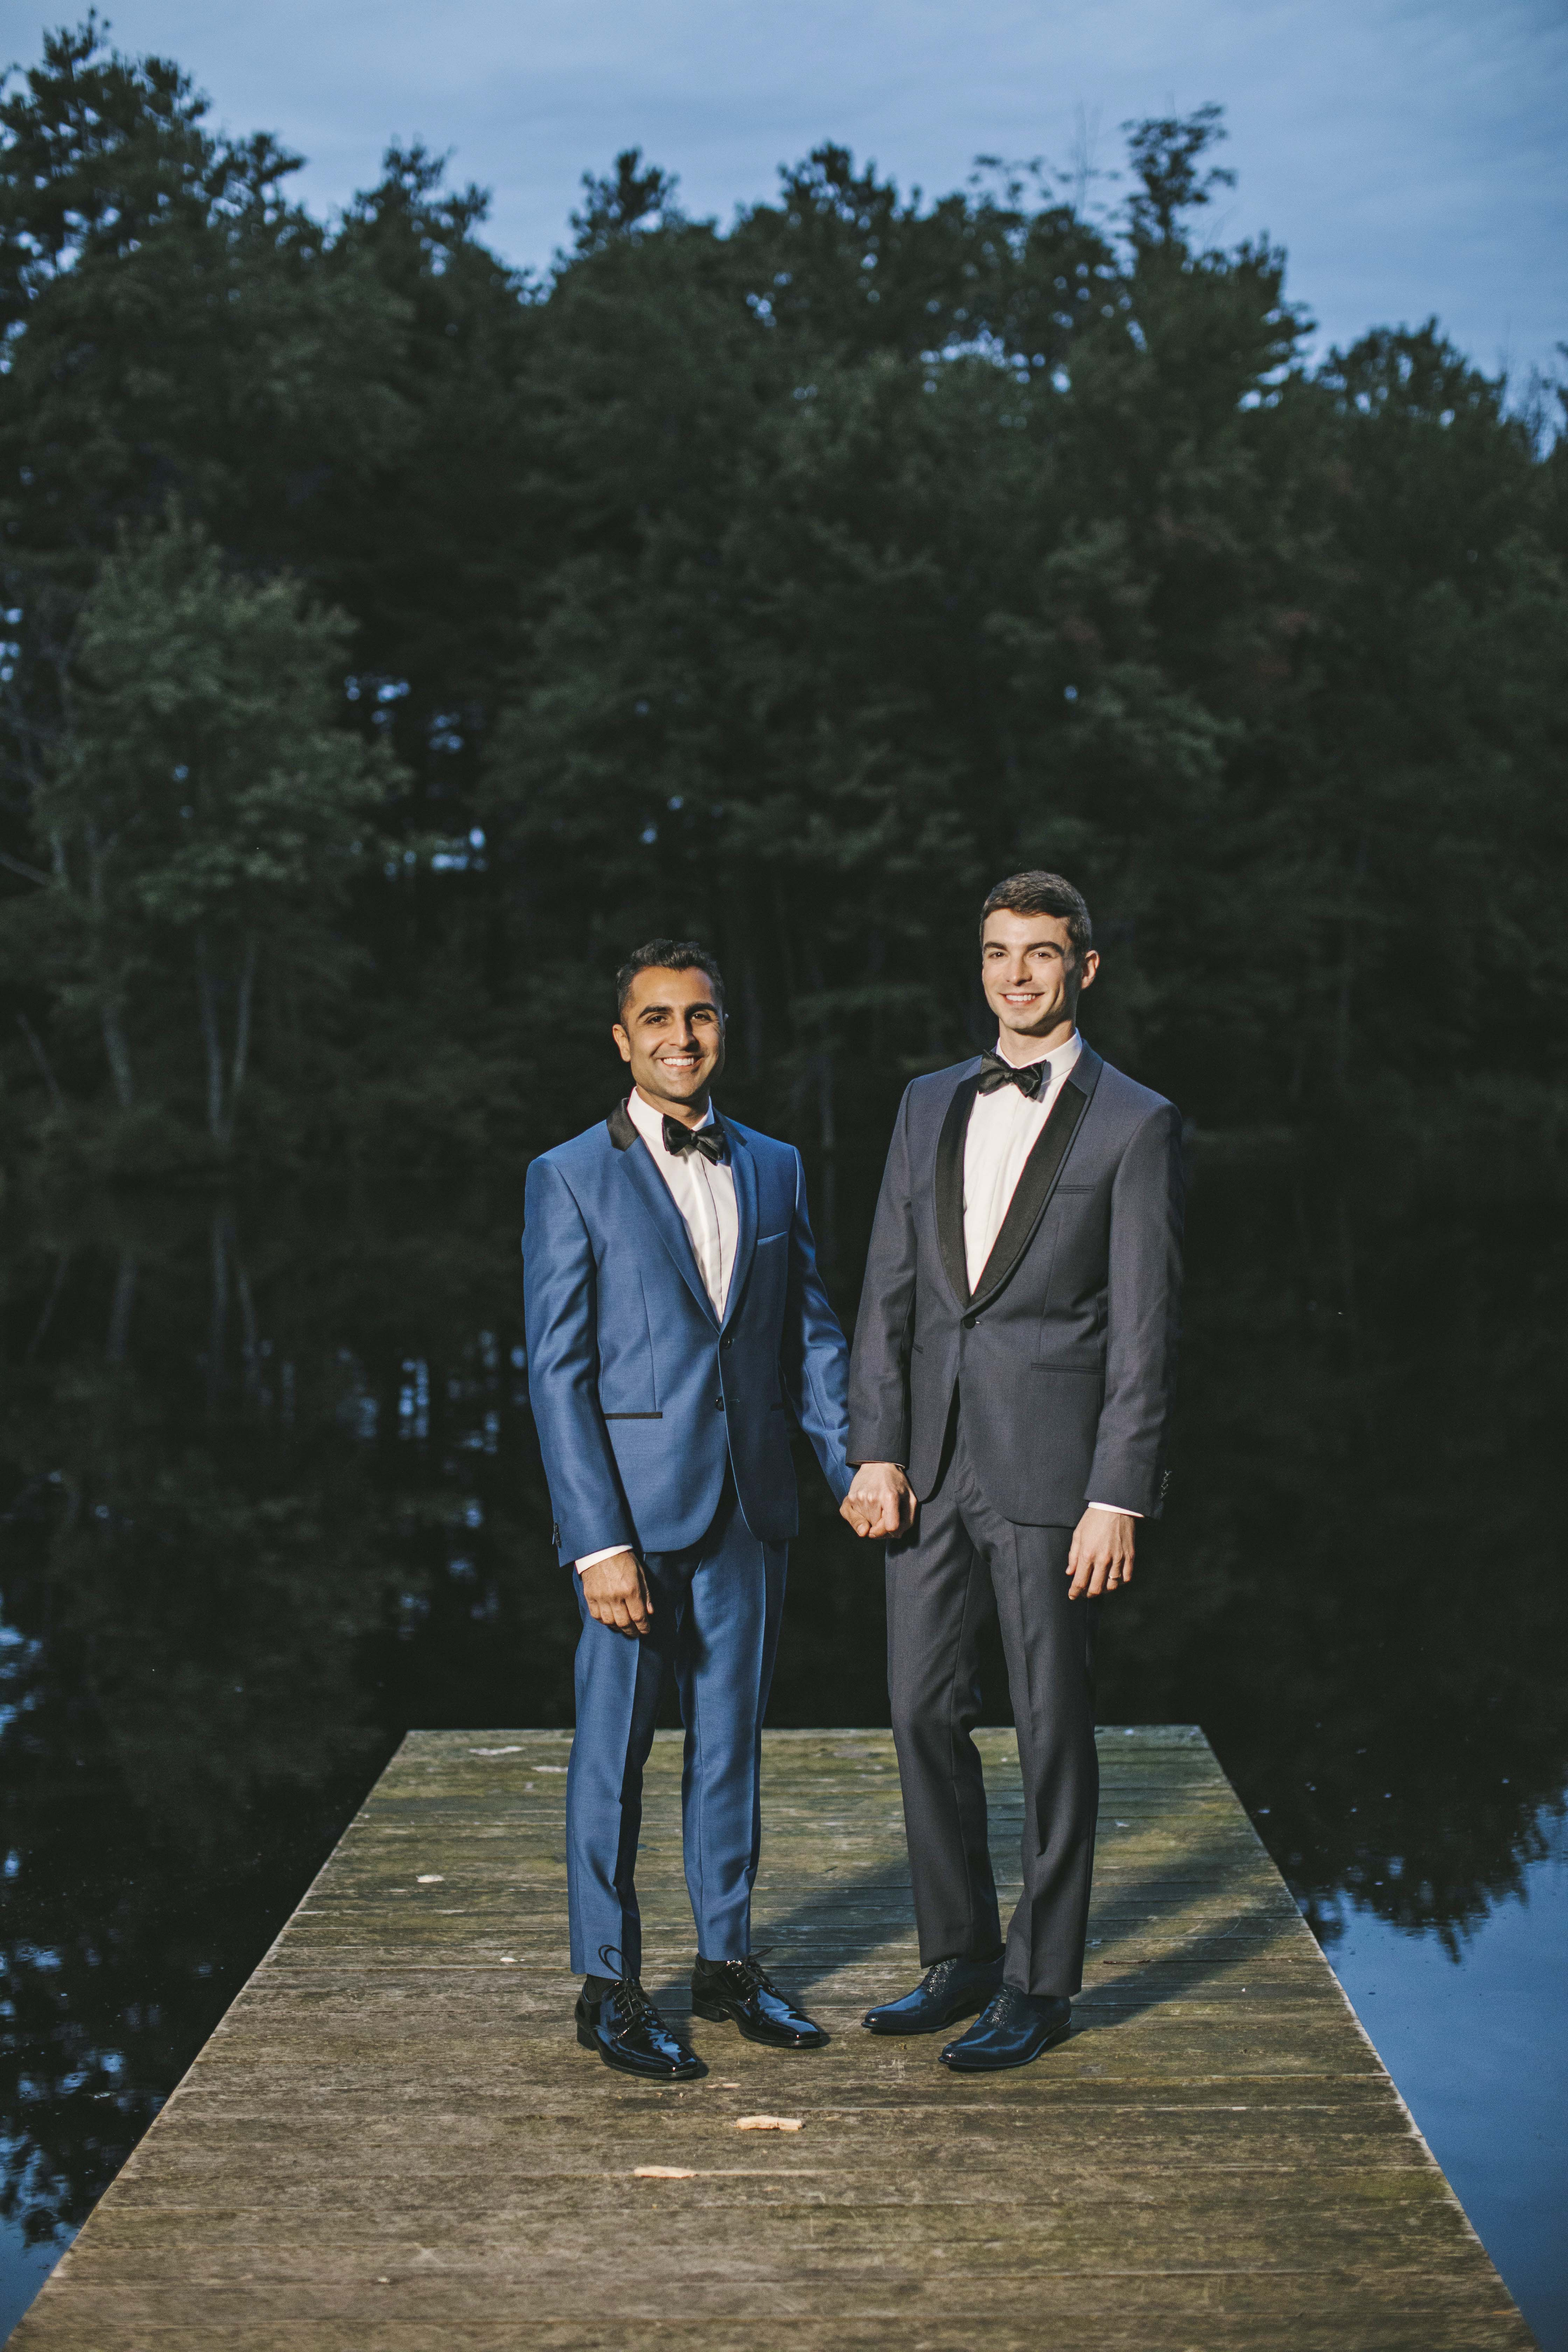 sanjay steven wedding grooms holding hands